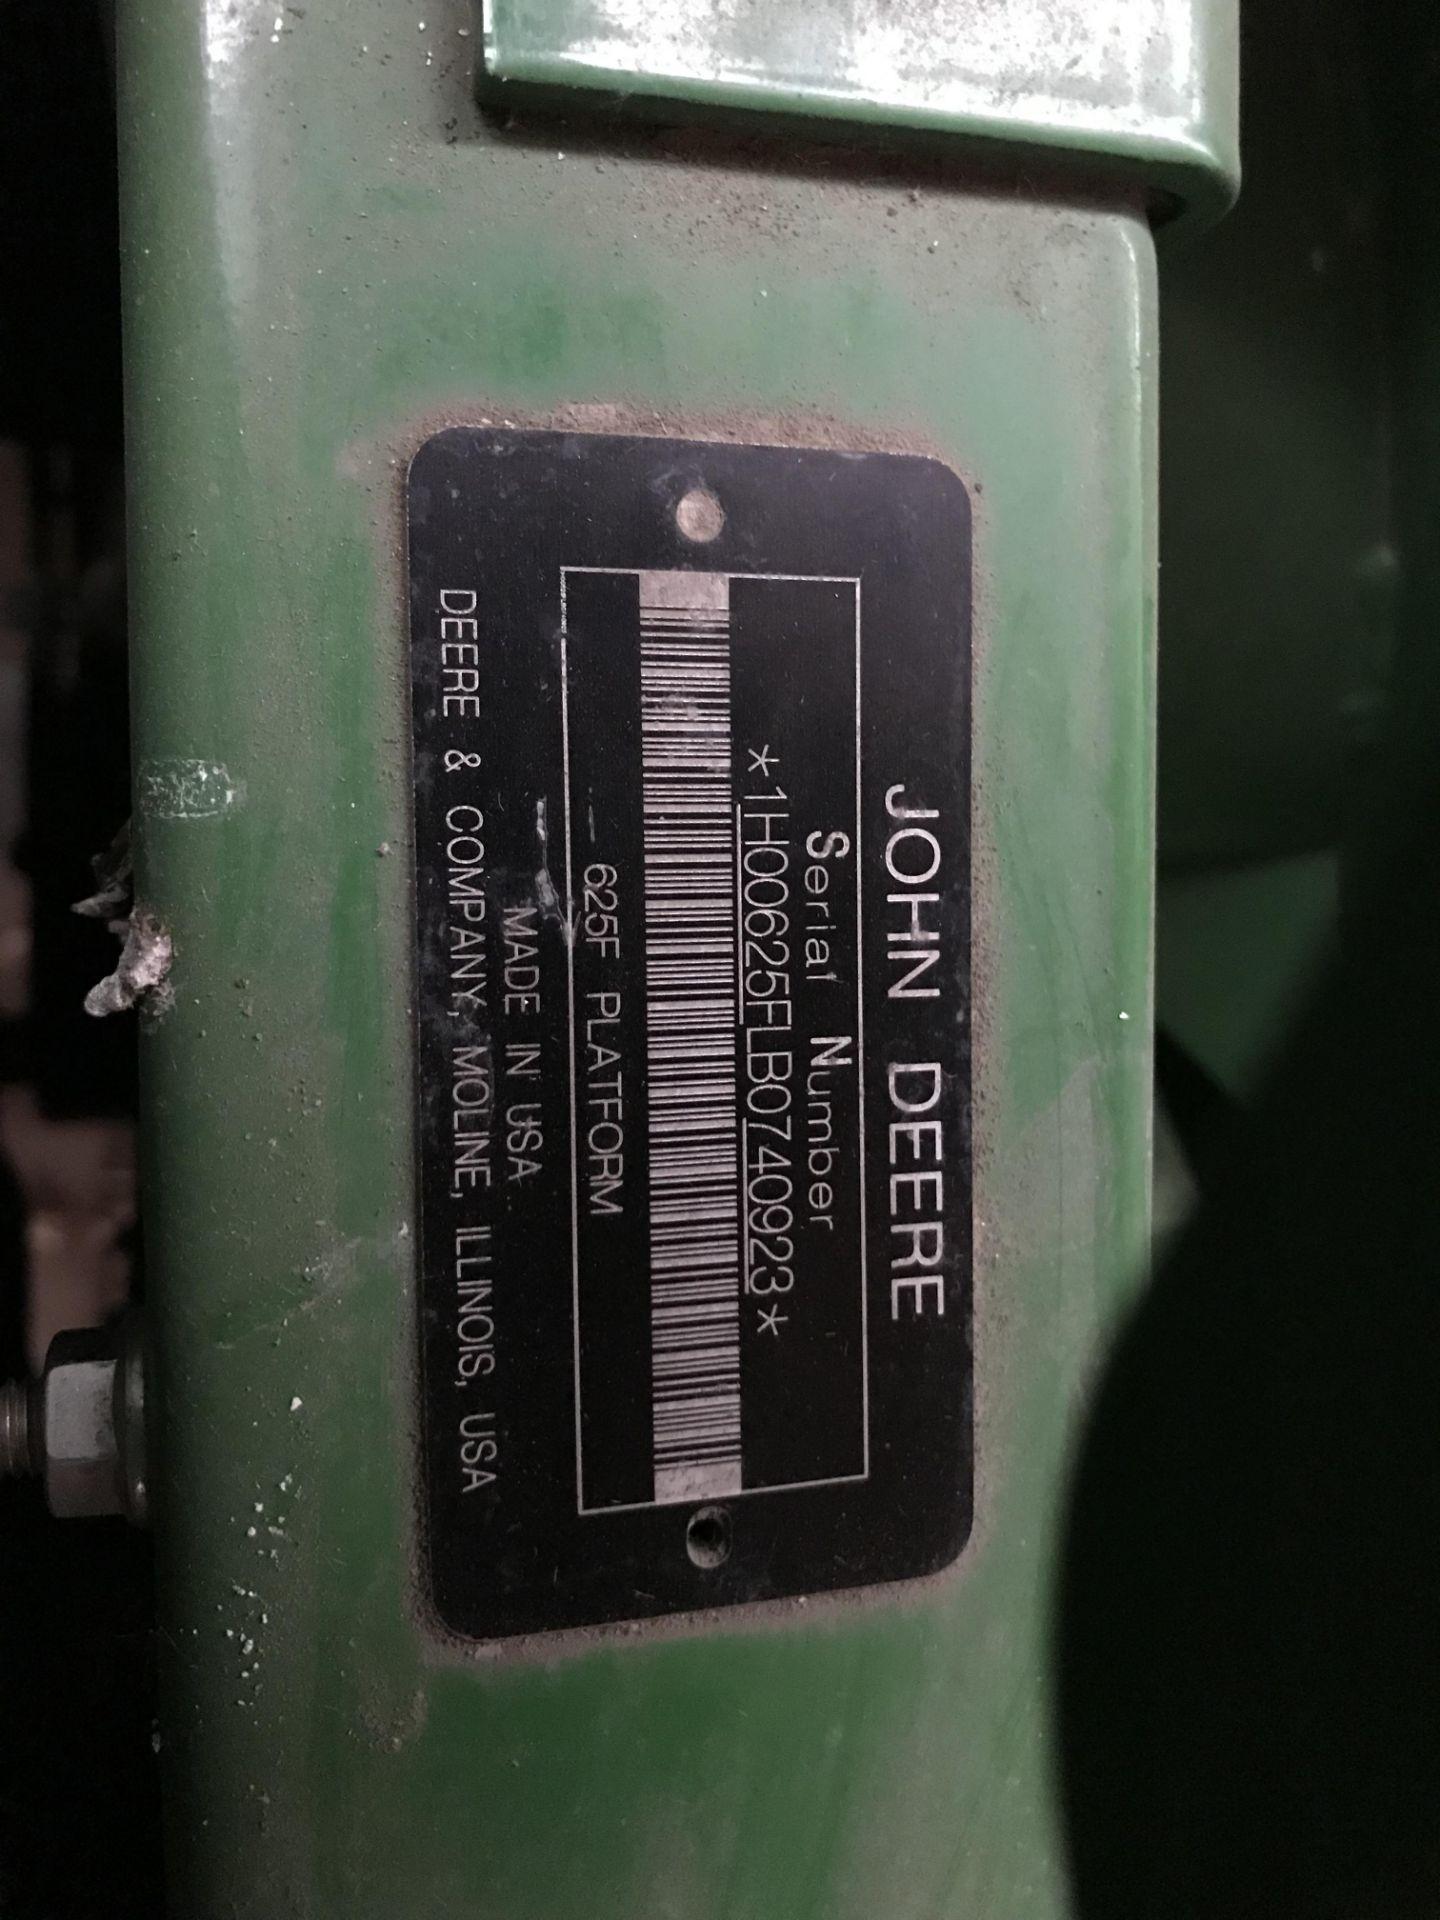 Lot 4 - 2011 JD 625F Hydra Flex, S#0740923, Poly, Full Width Fingers, Single Point Hook-up, Stubble &